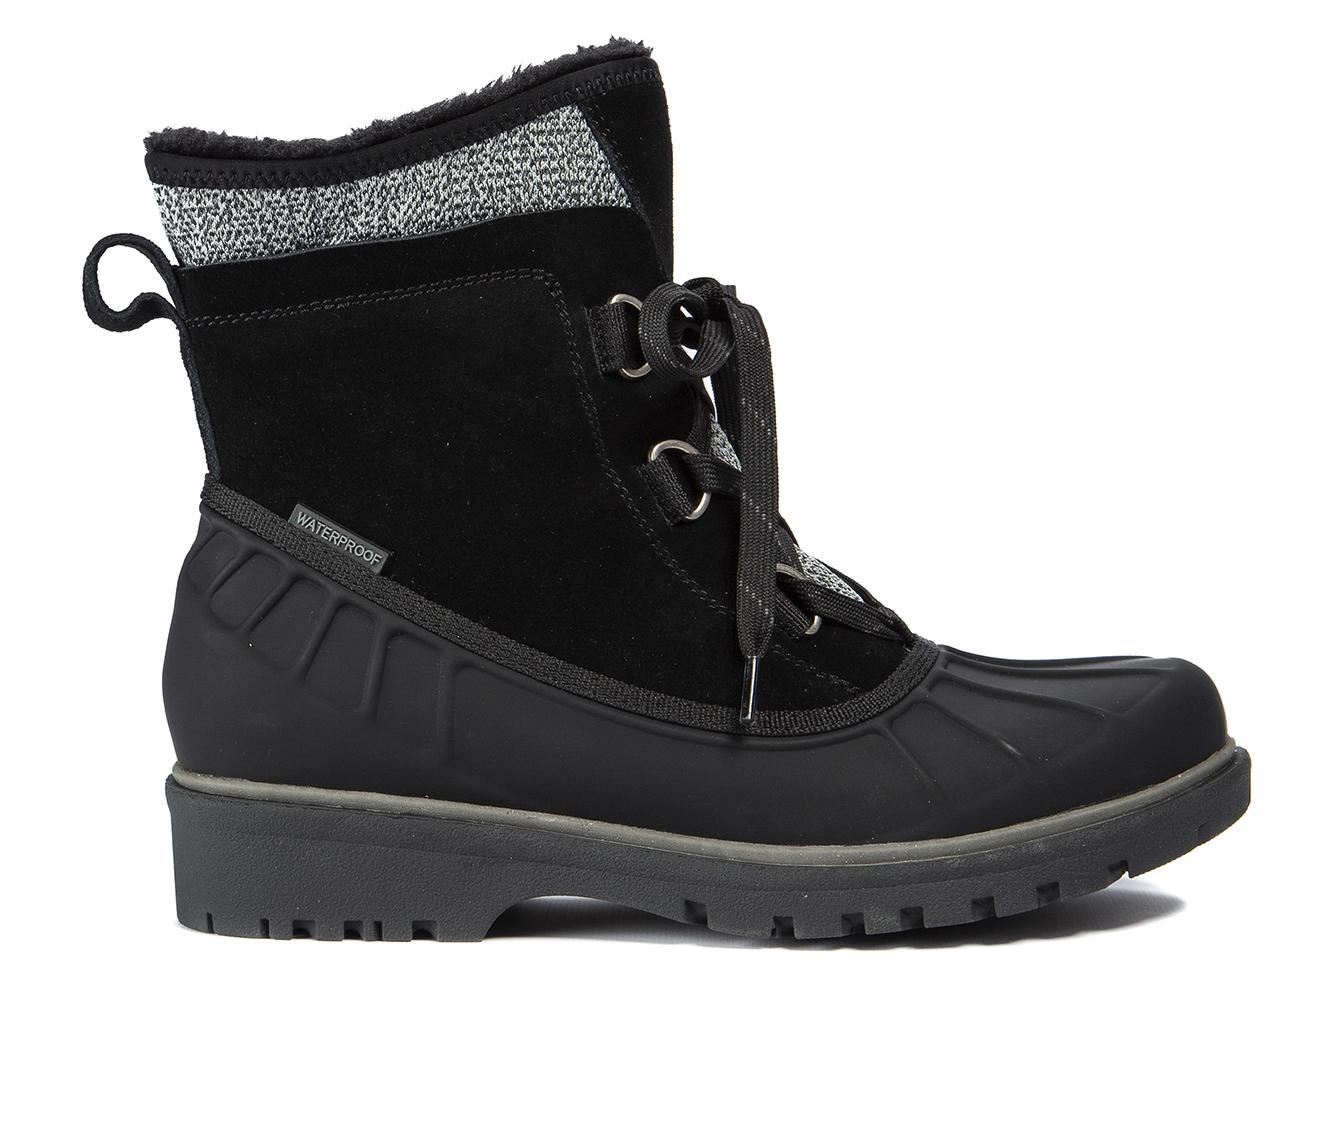 Baretraps Springer Women's Boot (Black Leather)